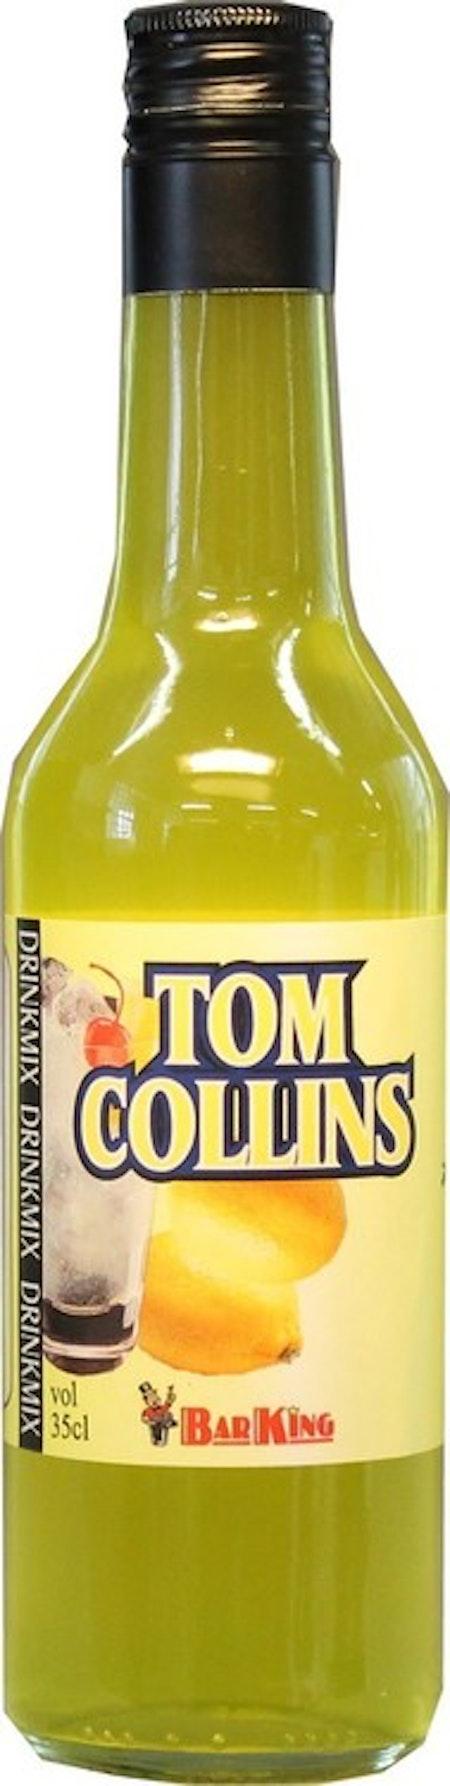 DRINKMIX / TOM COLLINS 35 CL